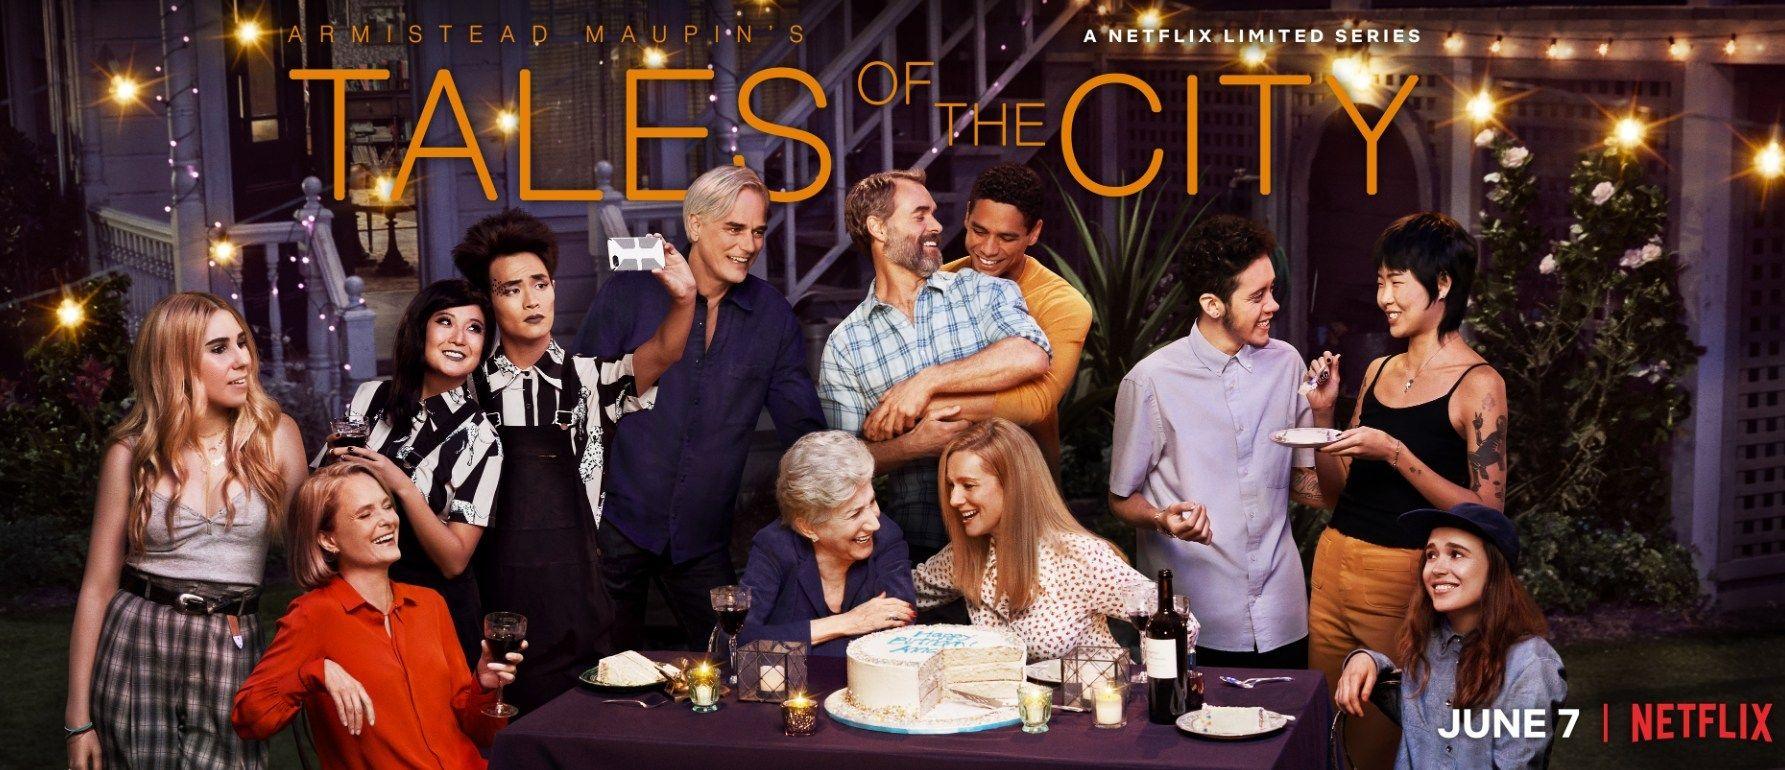 New To Netflix Armistead Maupin S Tales Of The City Sao Francisco Series Poster Leitores De Livros